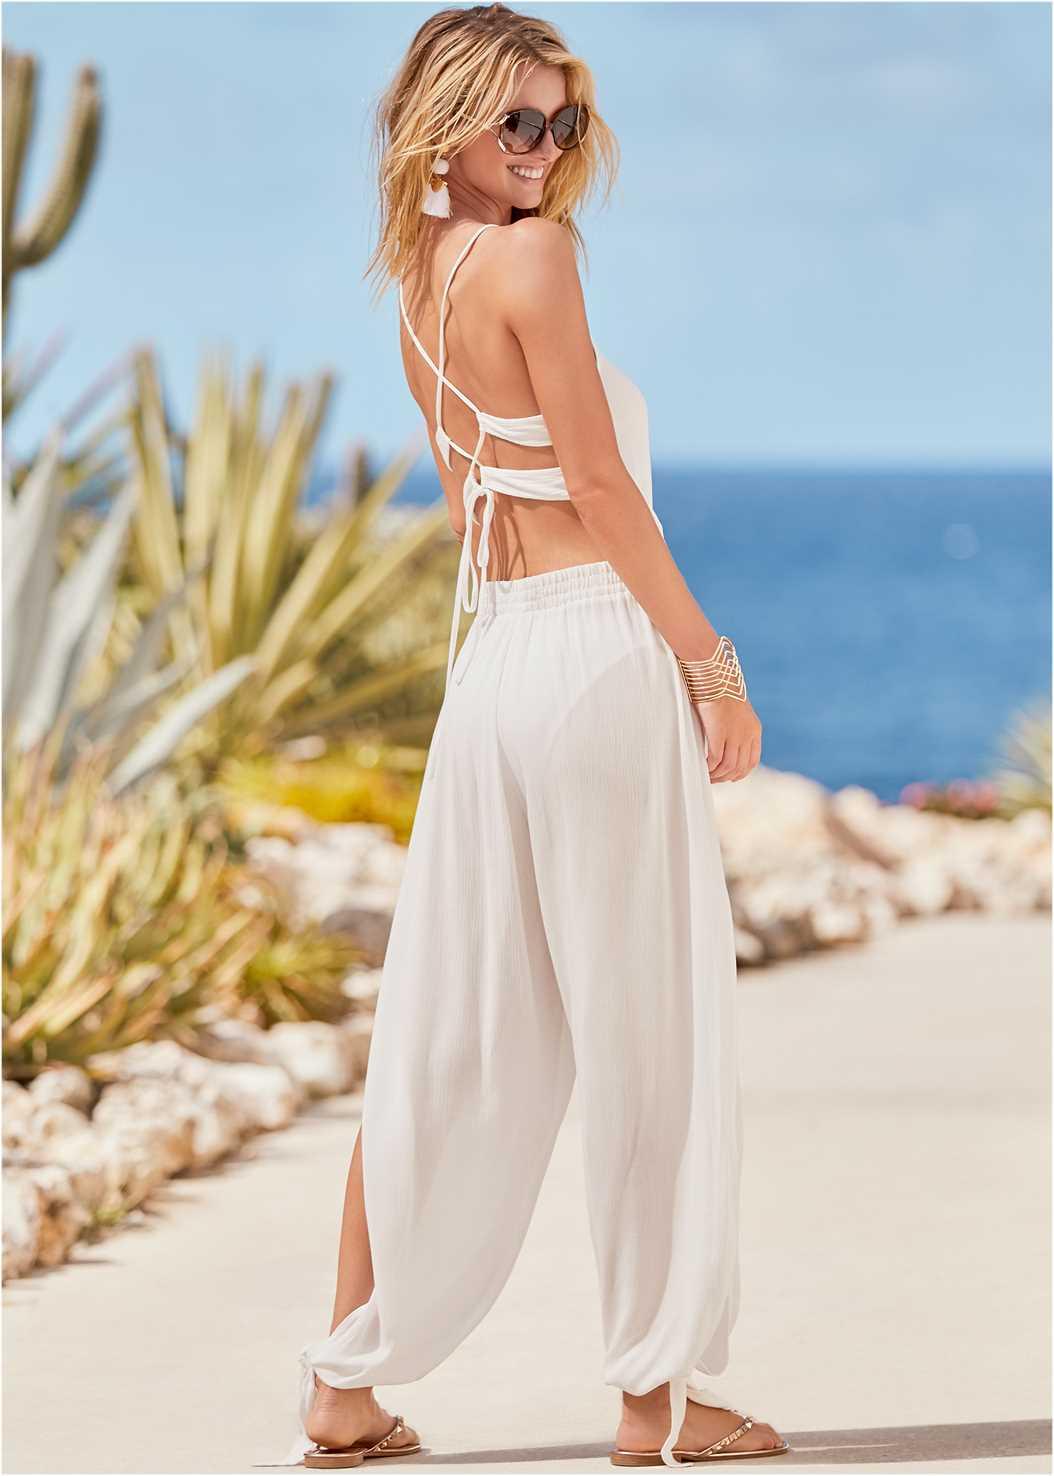 Strappy Back Cover-Up Jumpsuit,Triangle String Bikini Top,Scoop Front Classic Bikini Bottom ,Low Rise Classic Bikini Bottom ,Fringe Drop Earrings